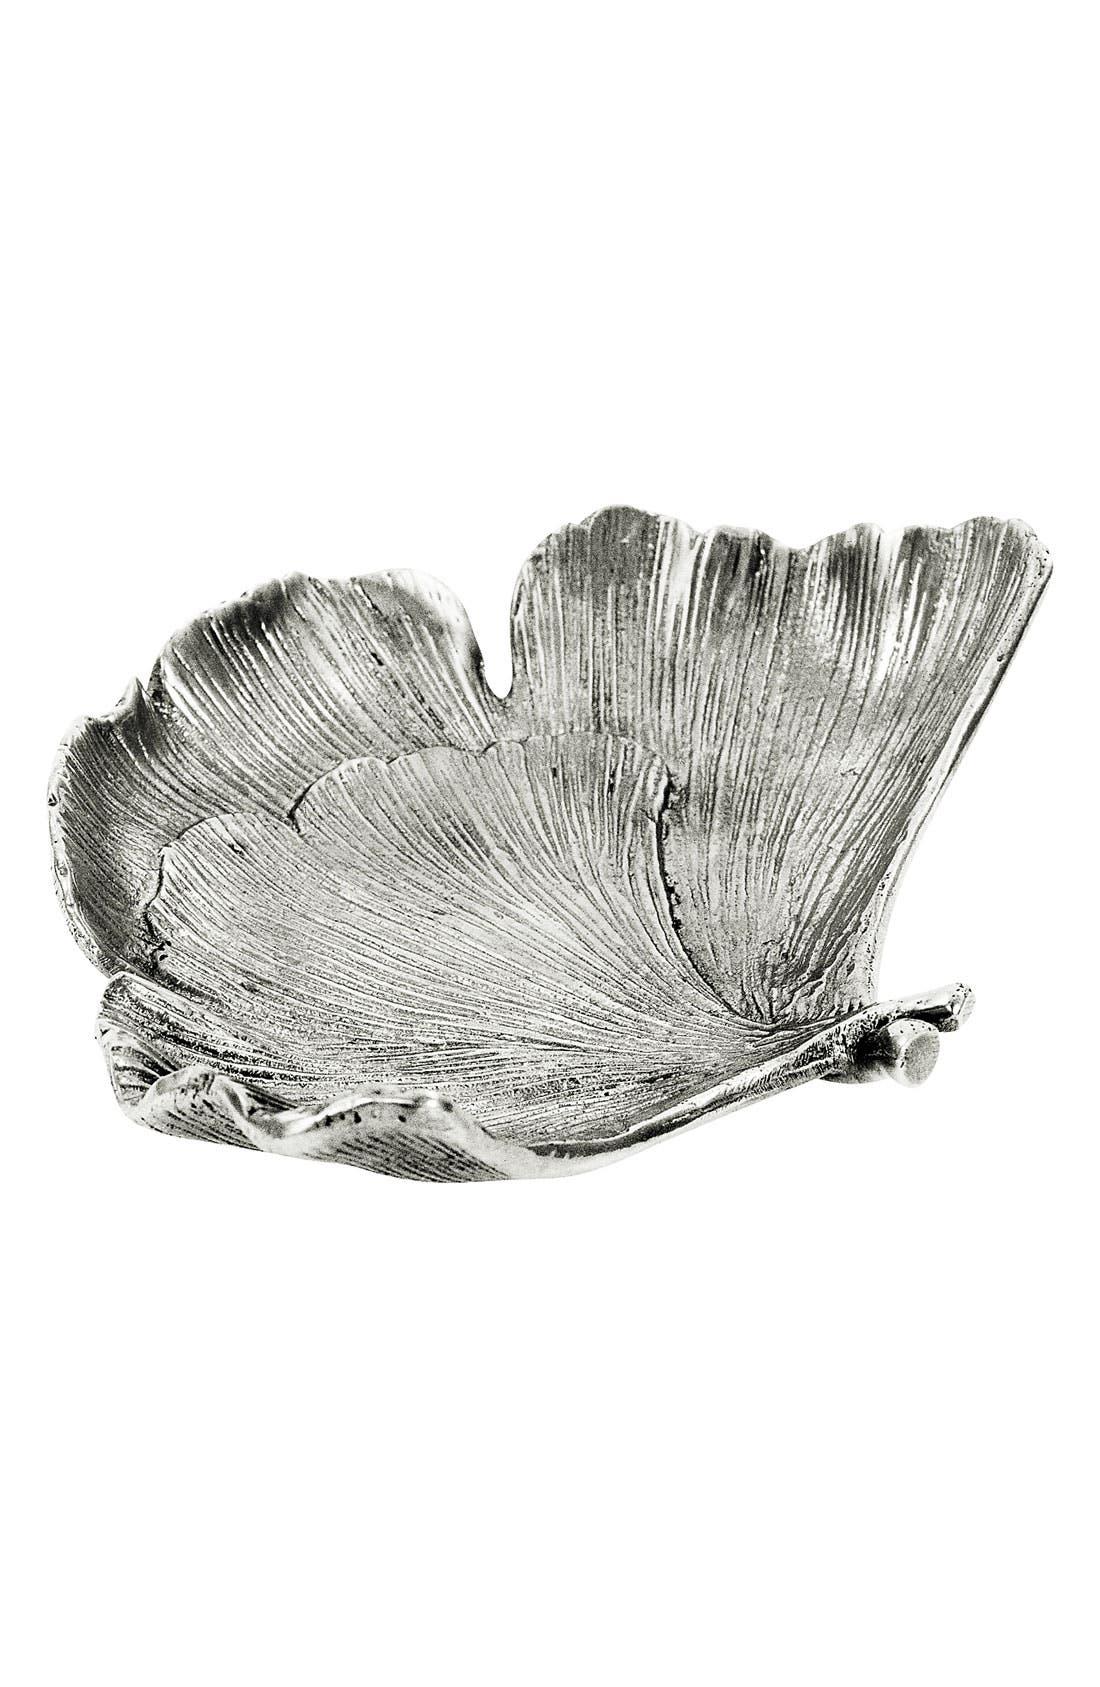 Alternate Image 1 Selected - Michael Aram 'Ginkgo' Mini Dish